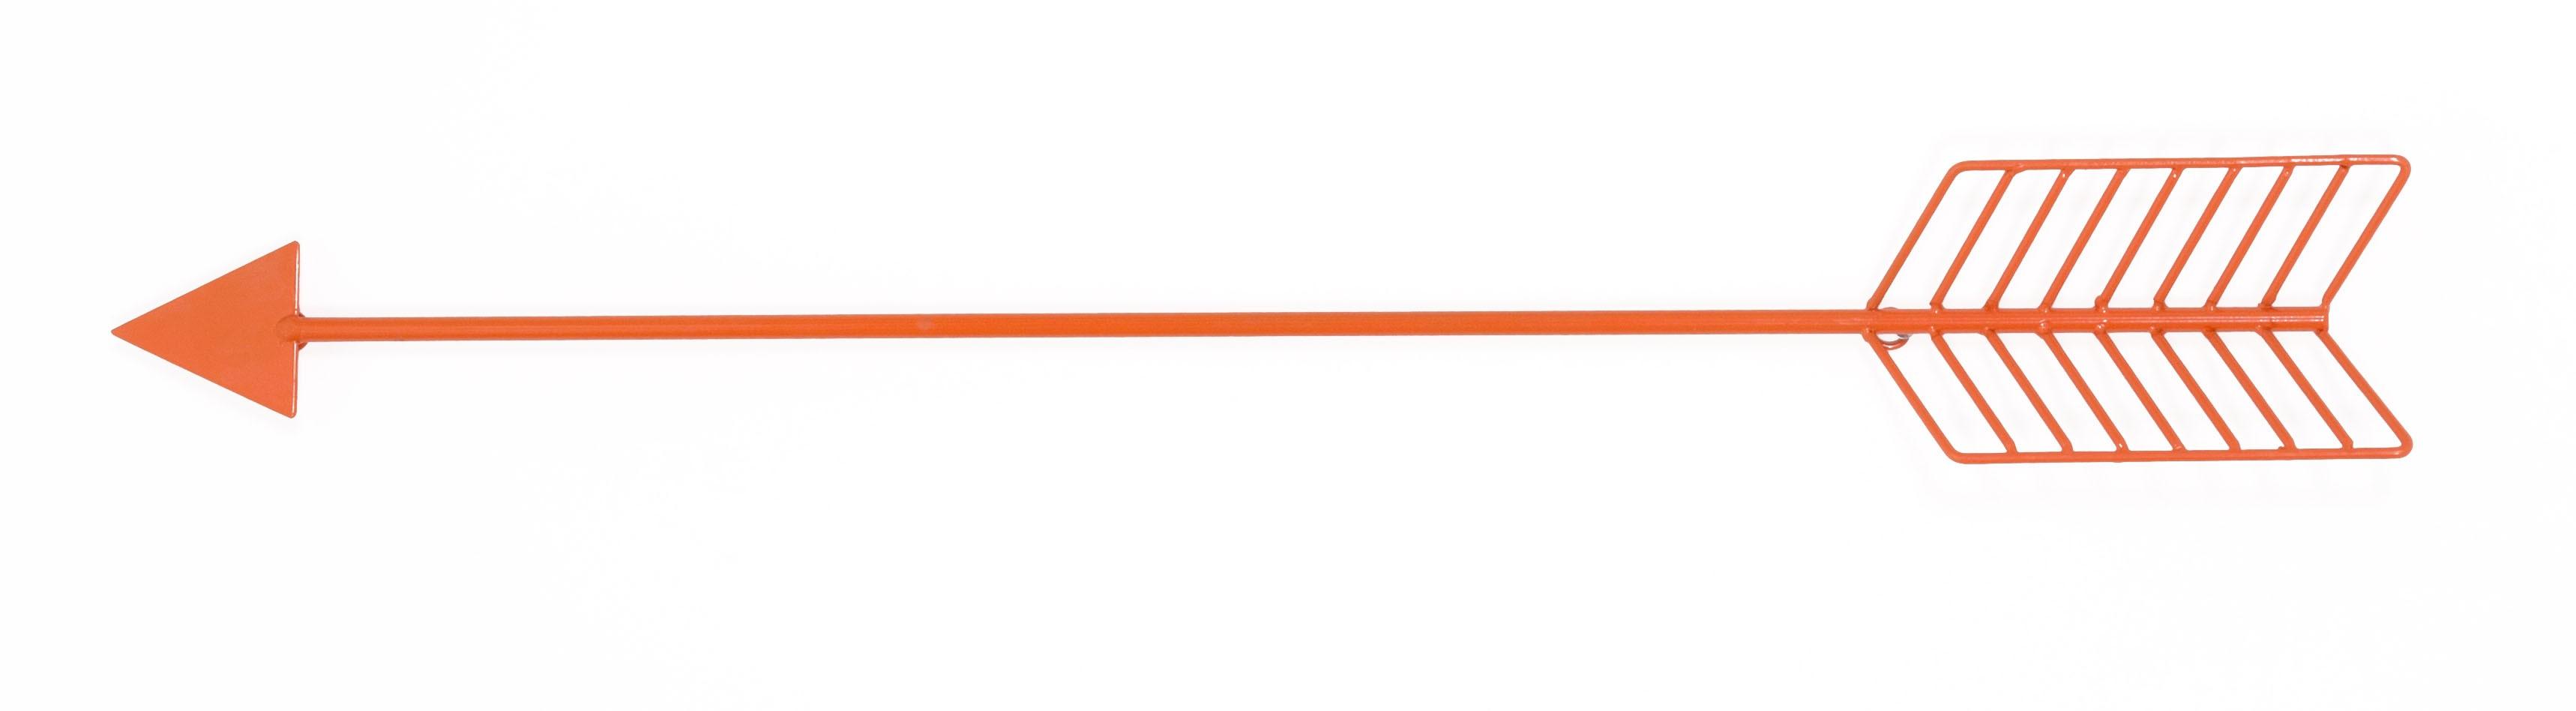 Arrows For Wall Decor : Bend arrow wall decor